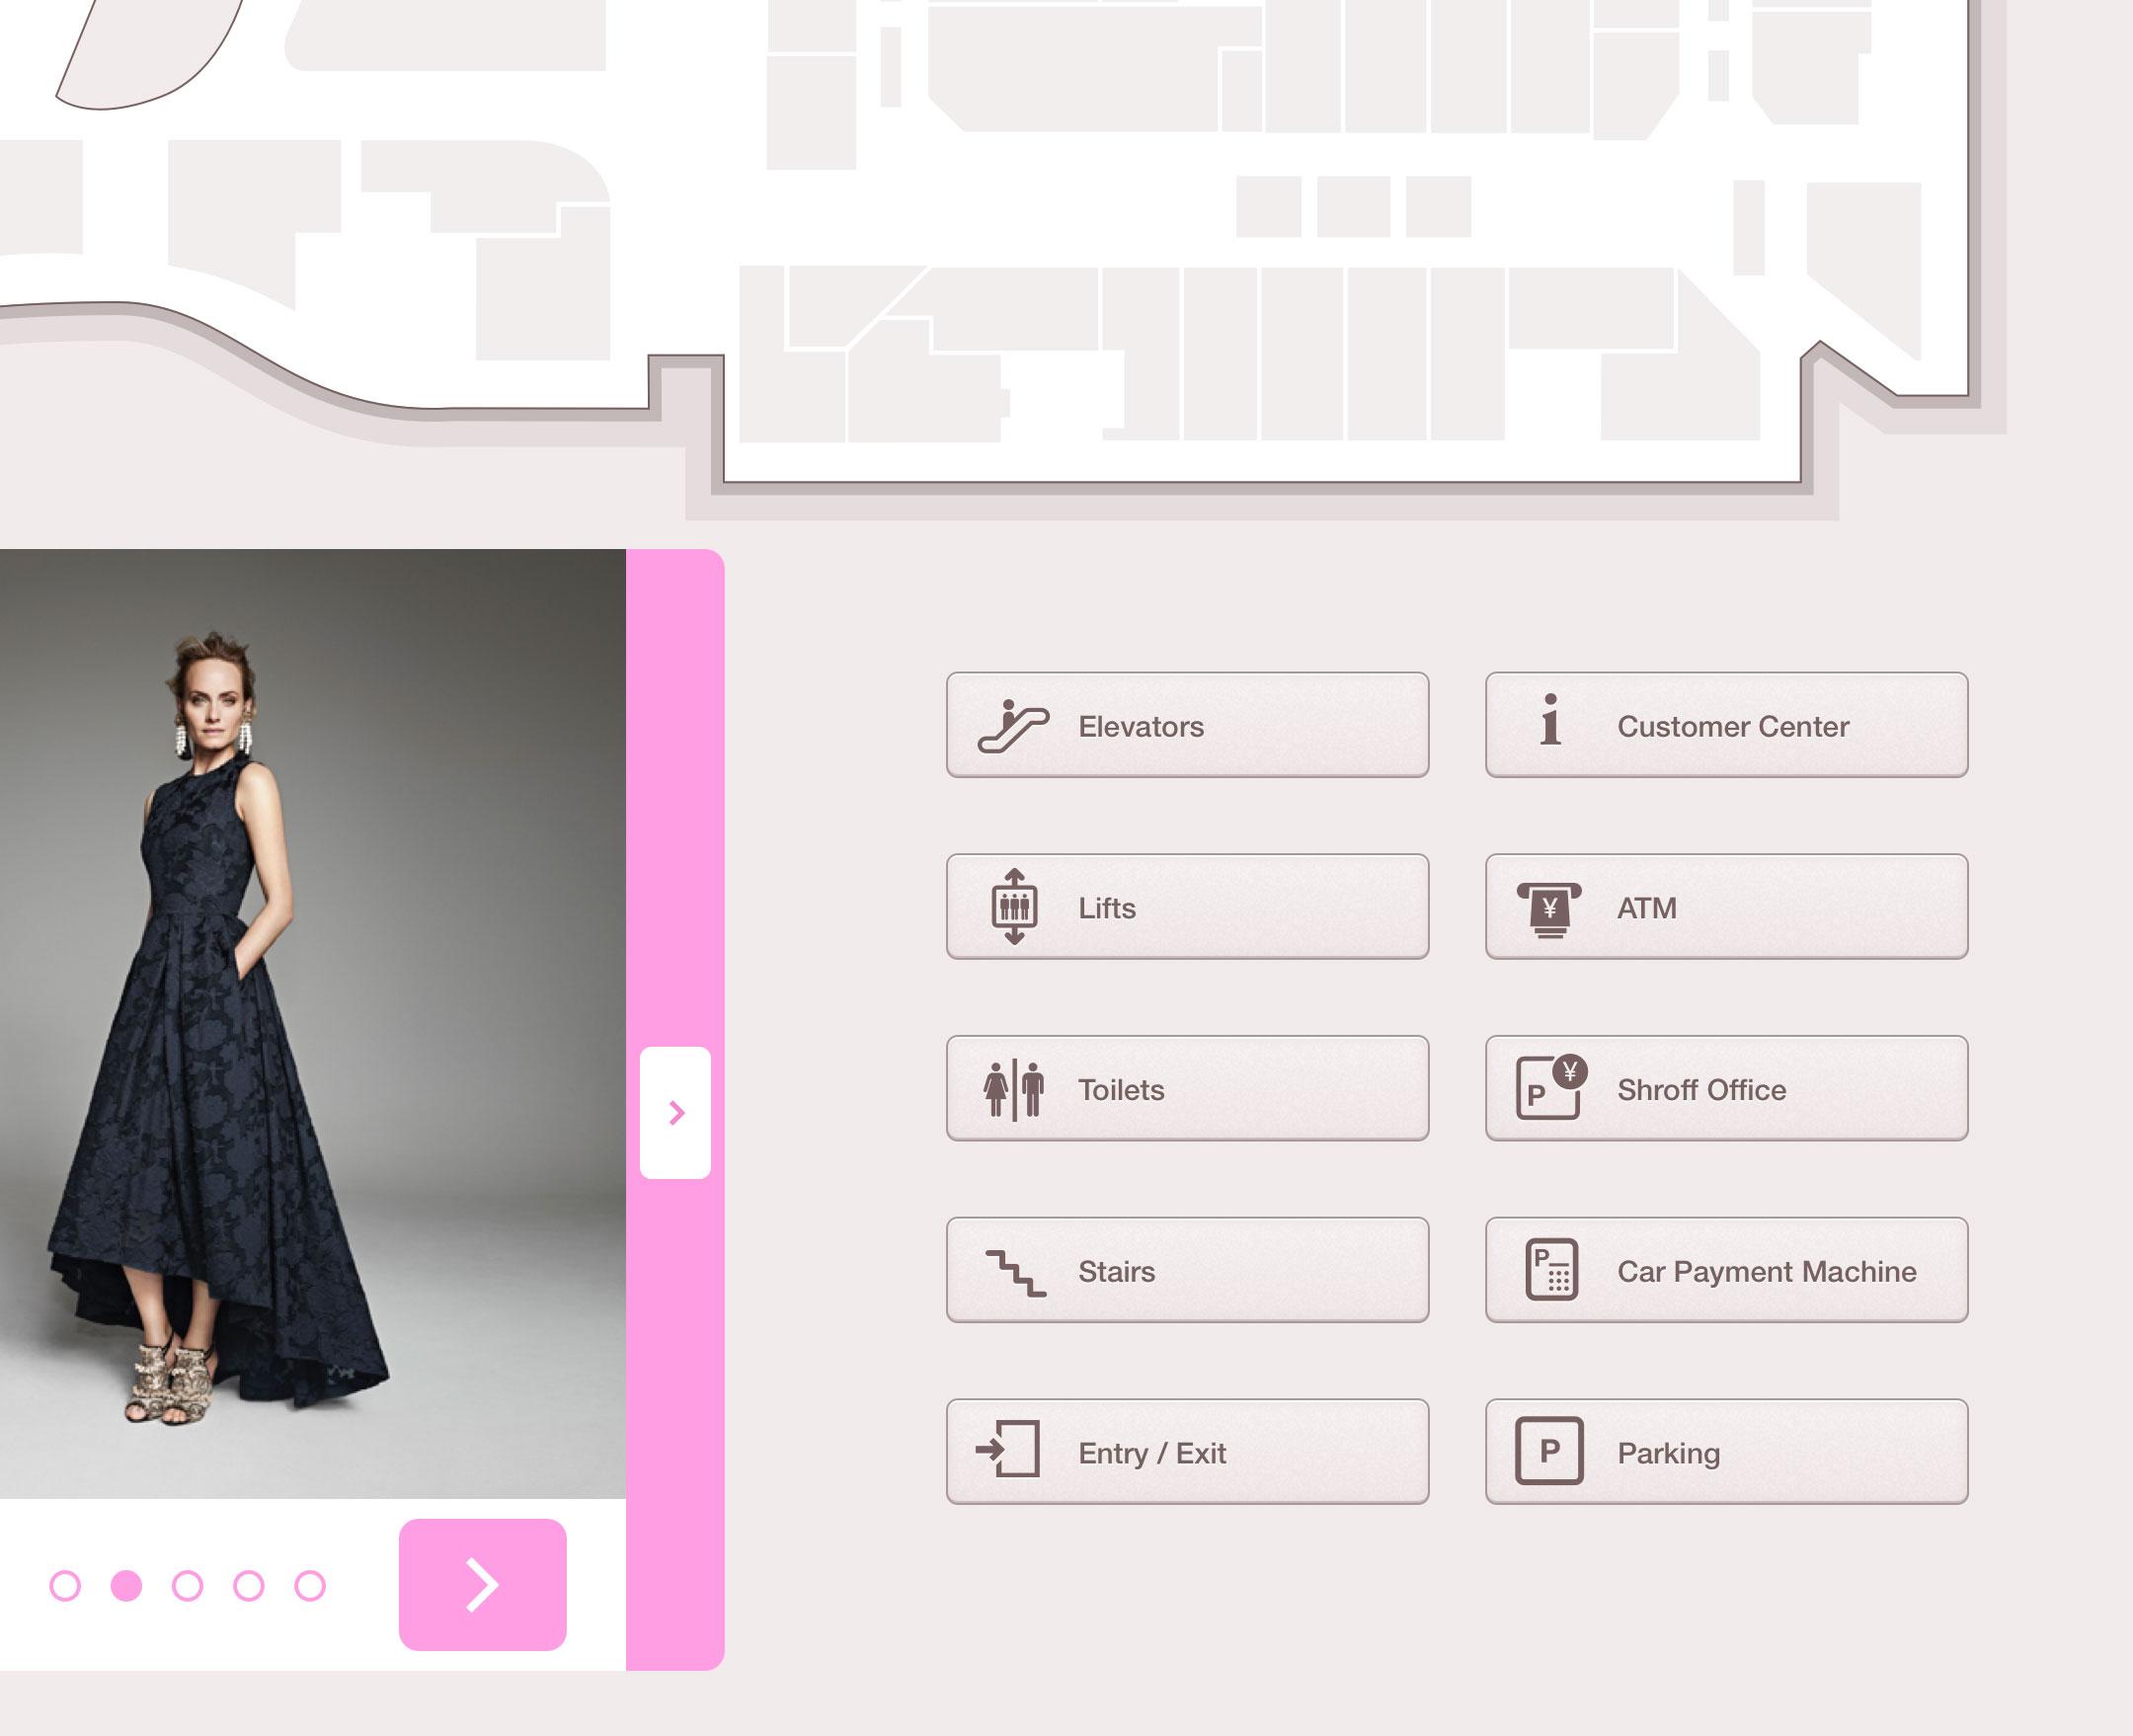 Kiosk Design details: facilities' buttons